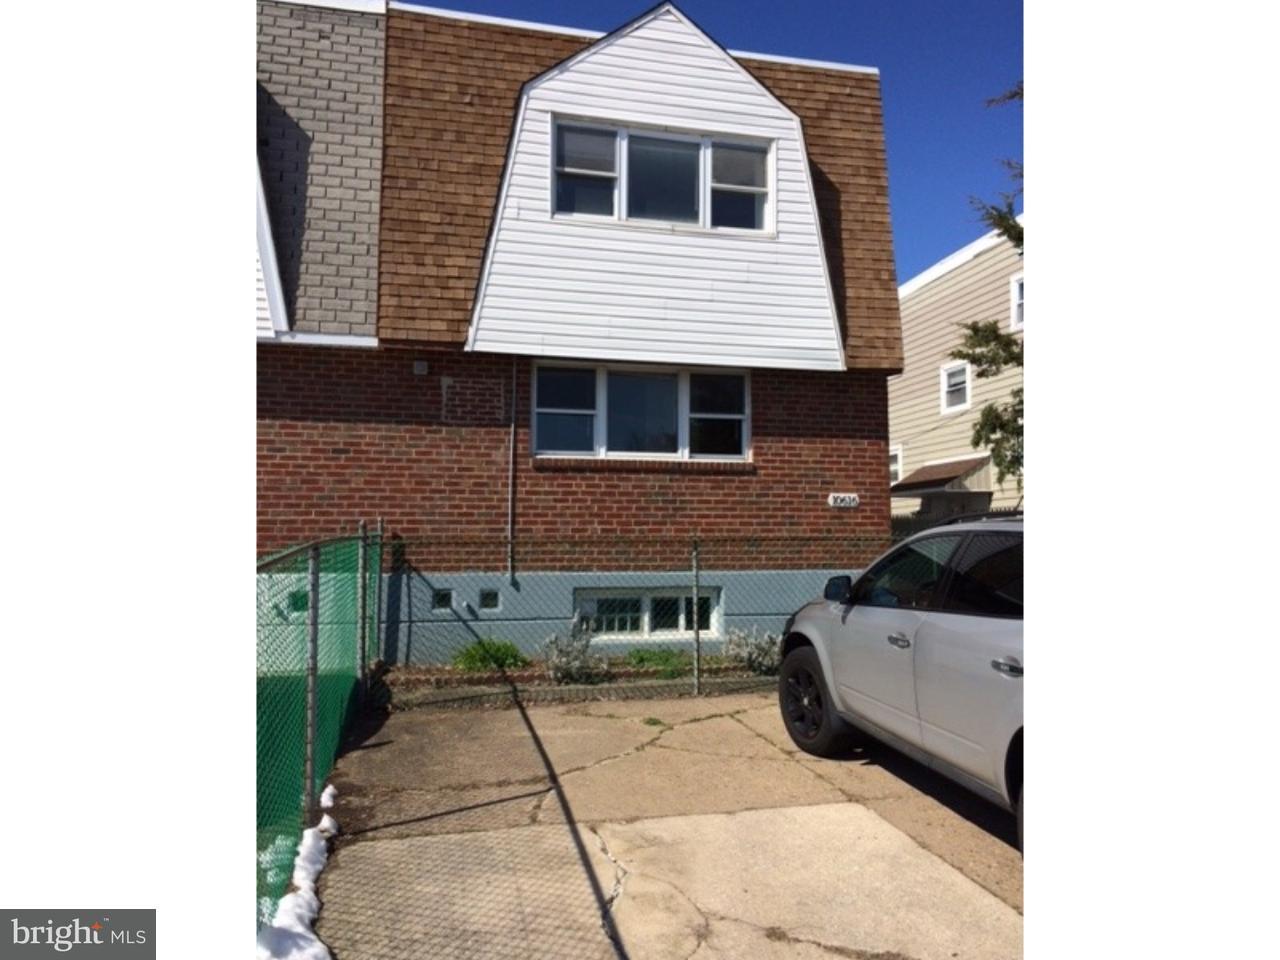 10616  Evans Street Philadelphia, PA 19116